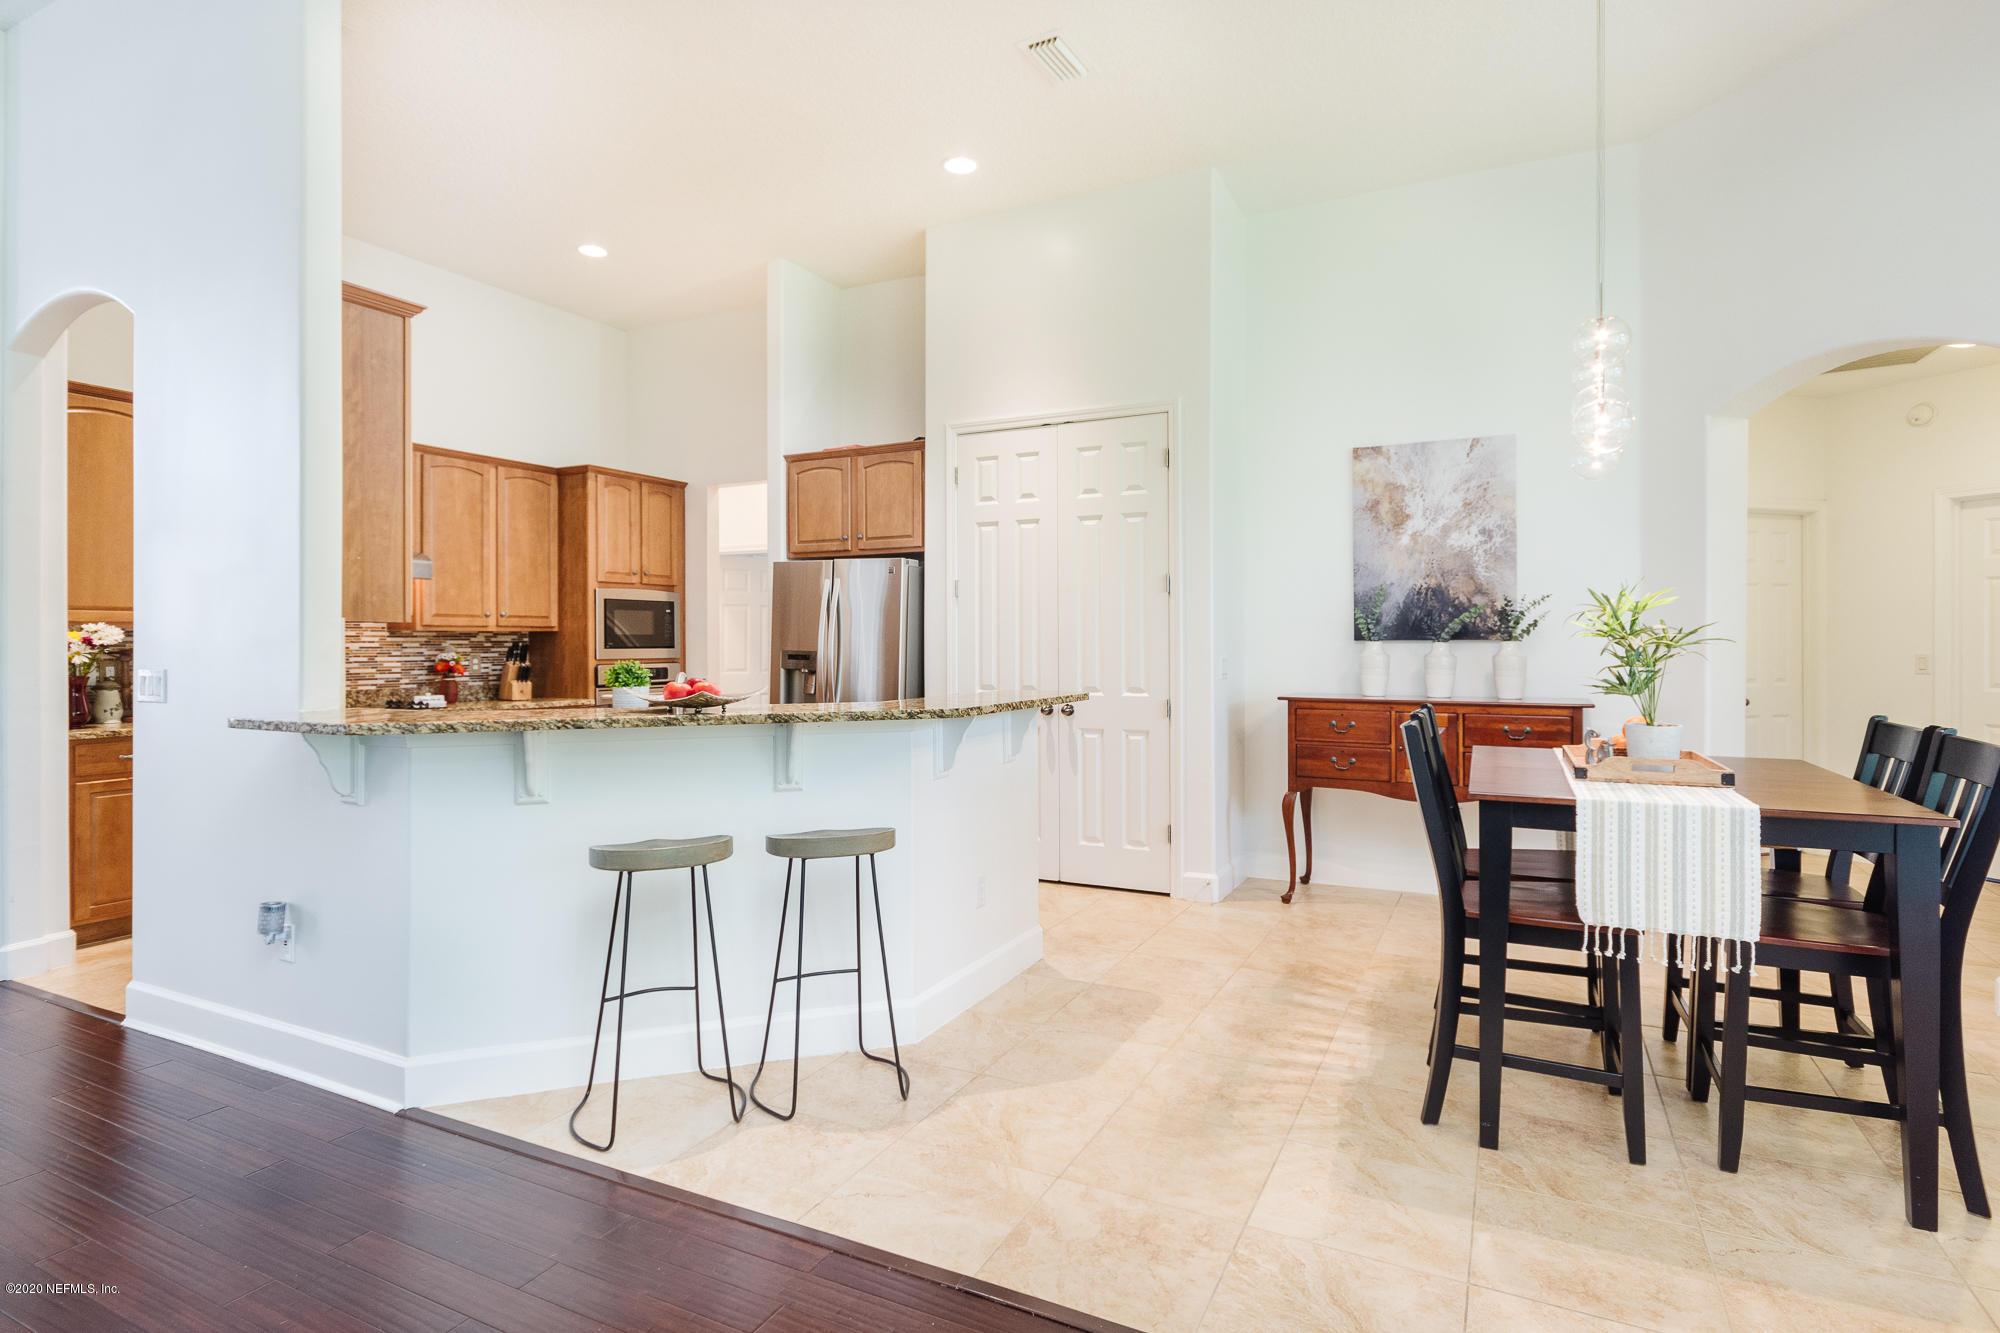 1376 EAGLE CROSSING, ORANGE PARK, FLORIDA 32065, 4 Bedrooms Bedrooms, ,4 BathroomsBathrooms,Residential,For sale,EAGLE CROSSING,1077632